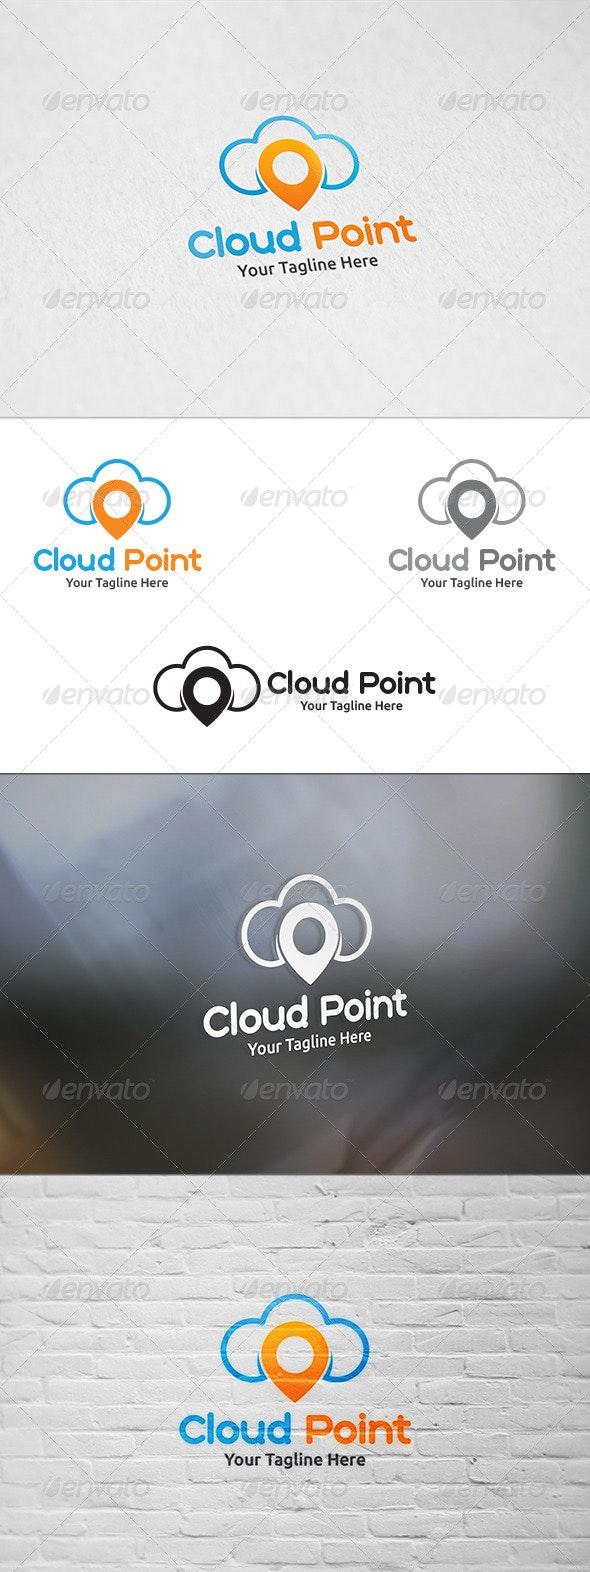 Cloud Point - Logo Template - Symbols Logo Templates